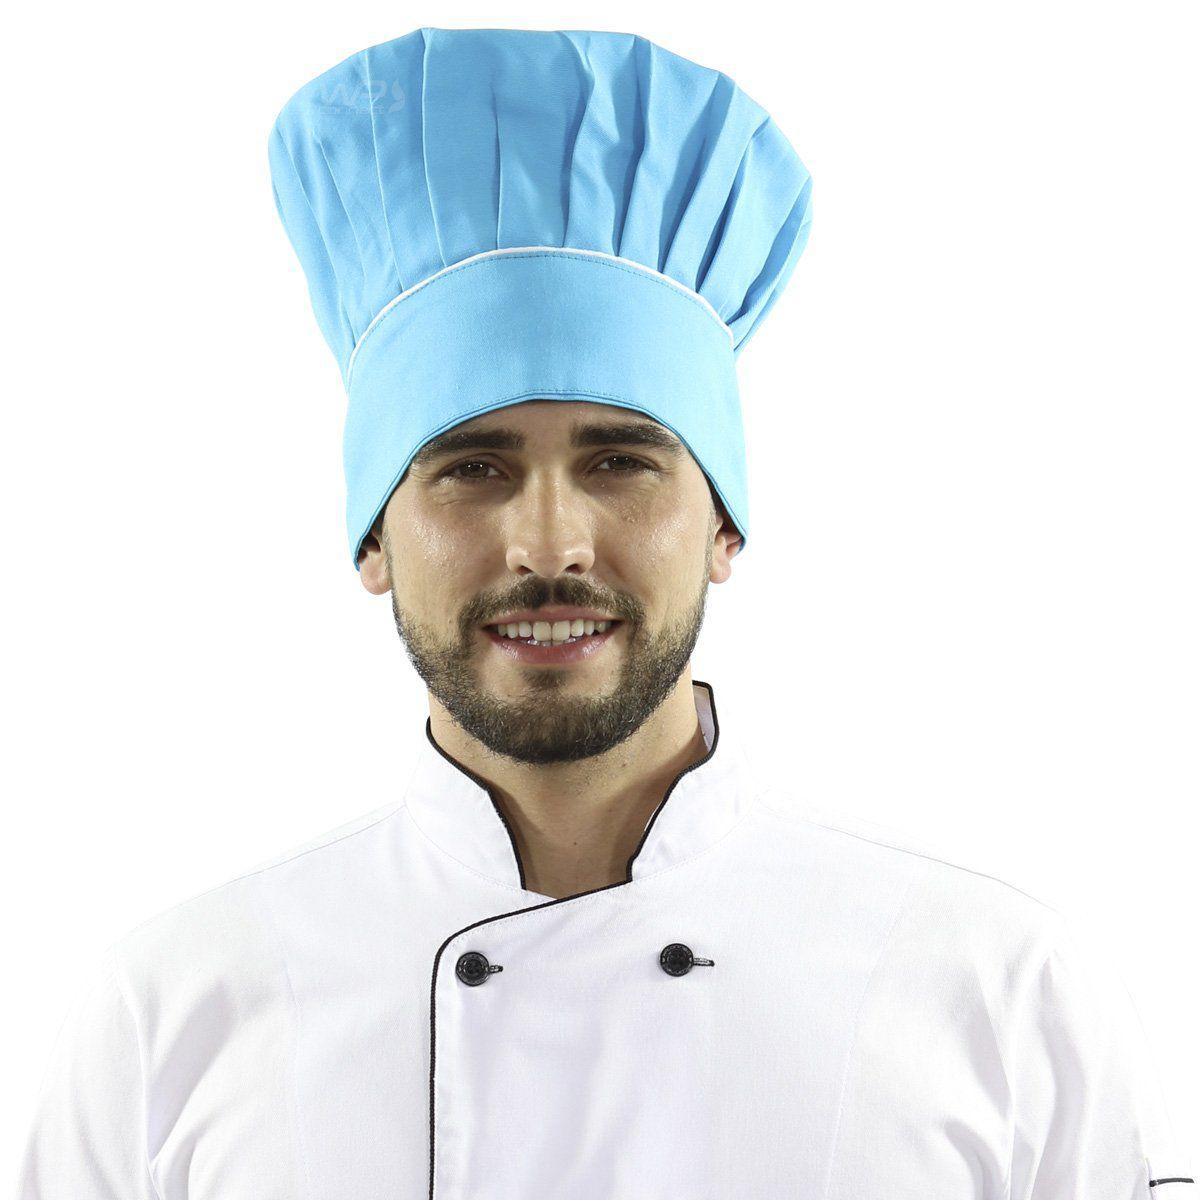 Touca Mestre Cuca Com Detalhe Listra Branca - Azul Caribe - WP Connect 63bbe7d524c